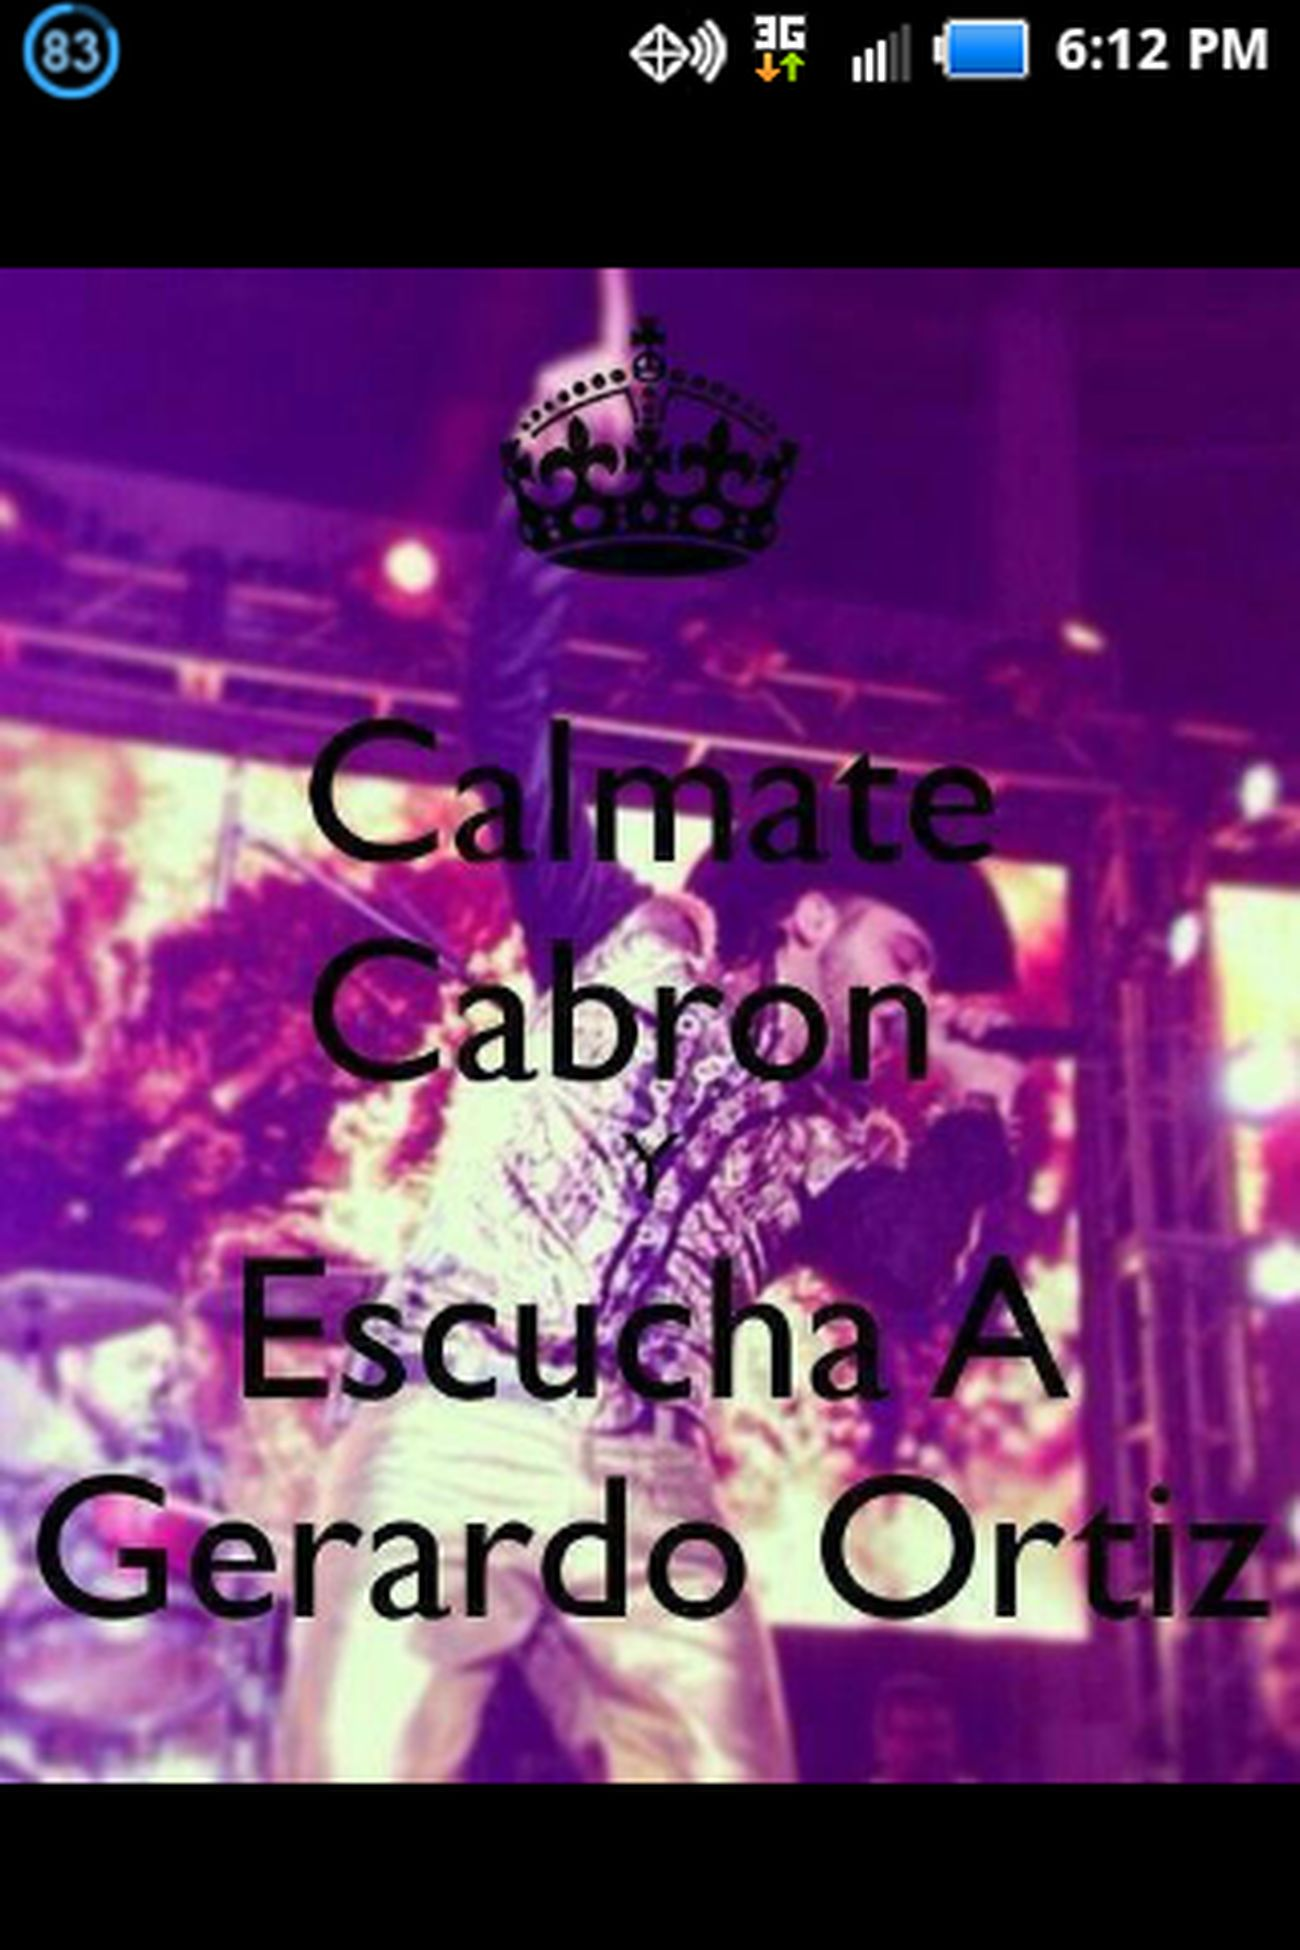 mi gerardo ortiz *-* Gerardo Ortiz ♥ Amo A Gerardo Ortiz